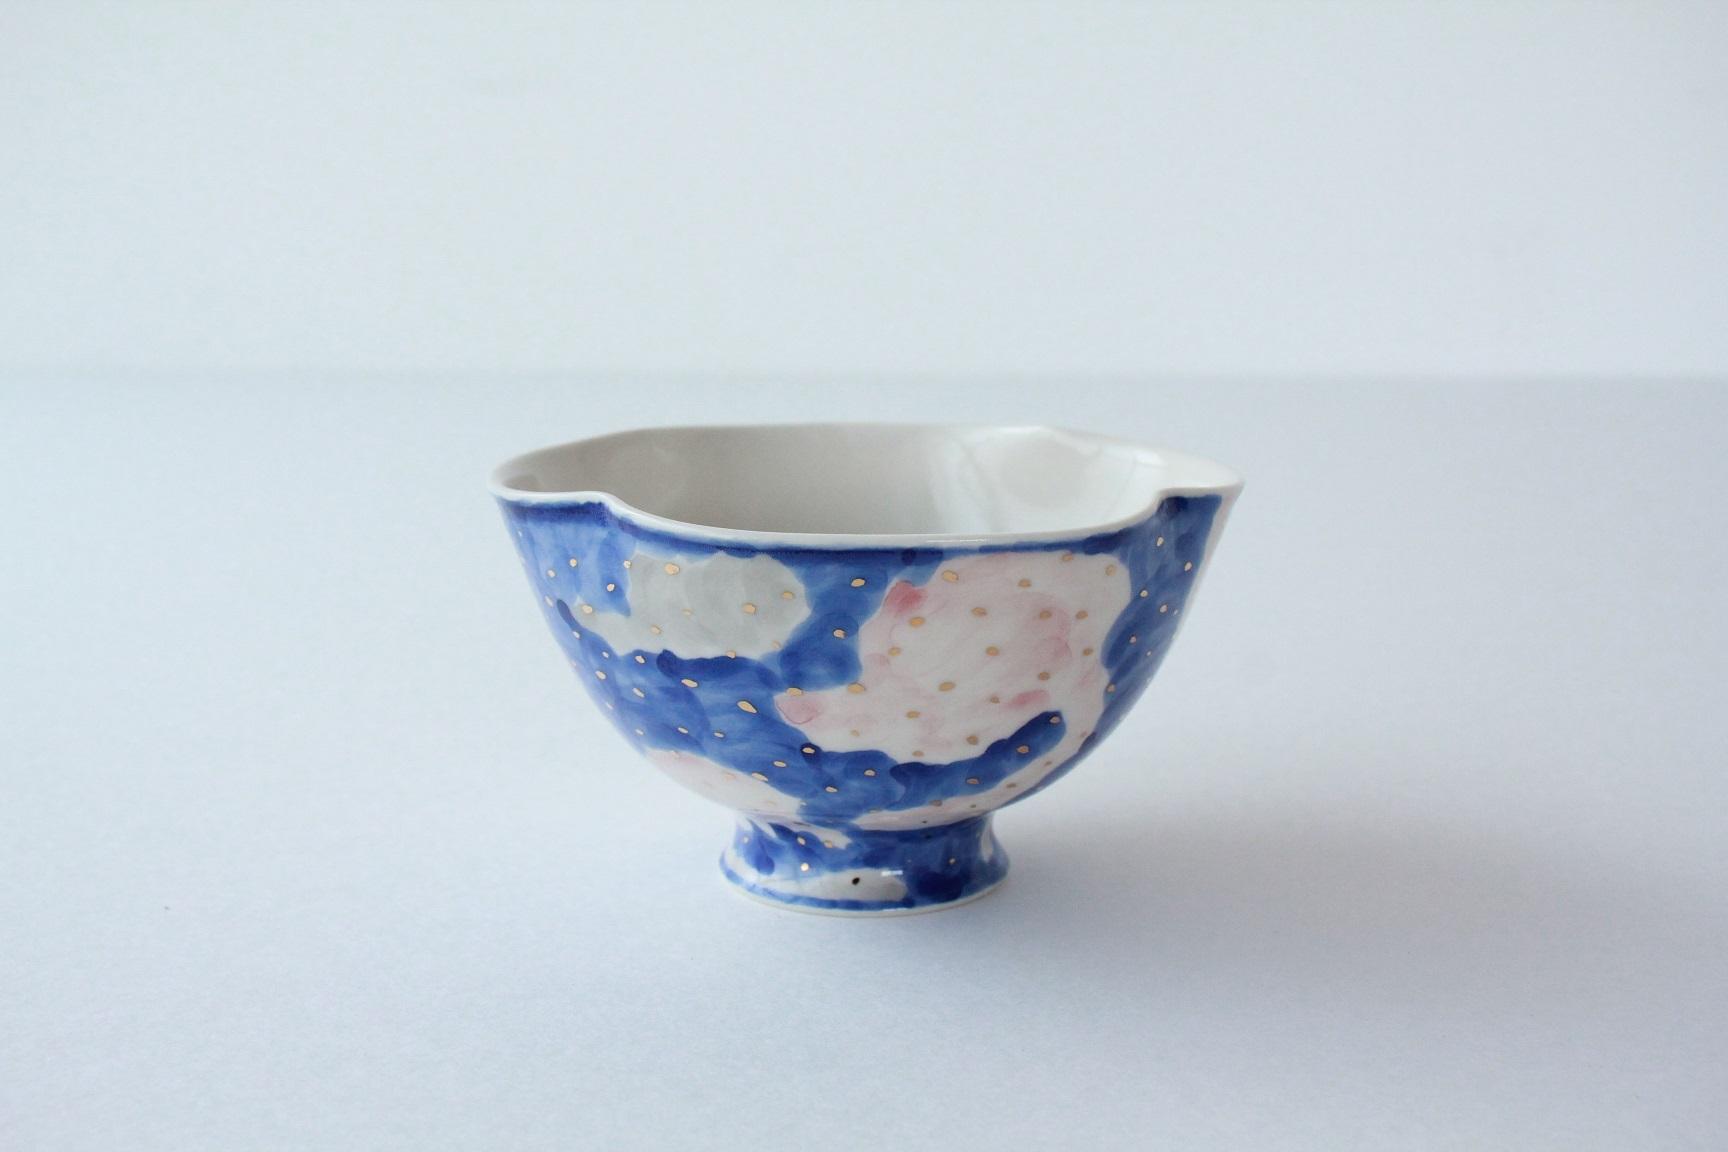 shuki flowerシリーズ デザート皿